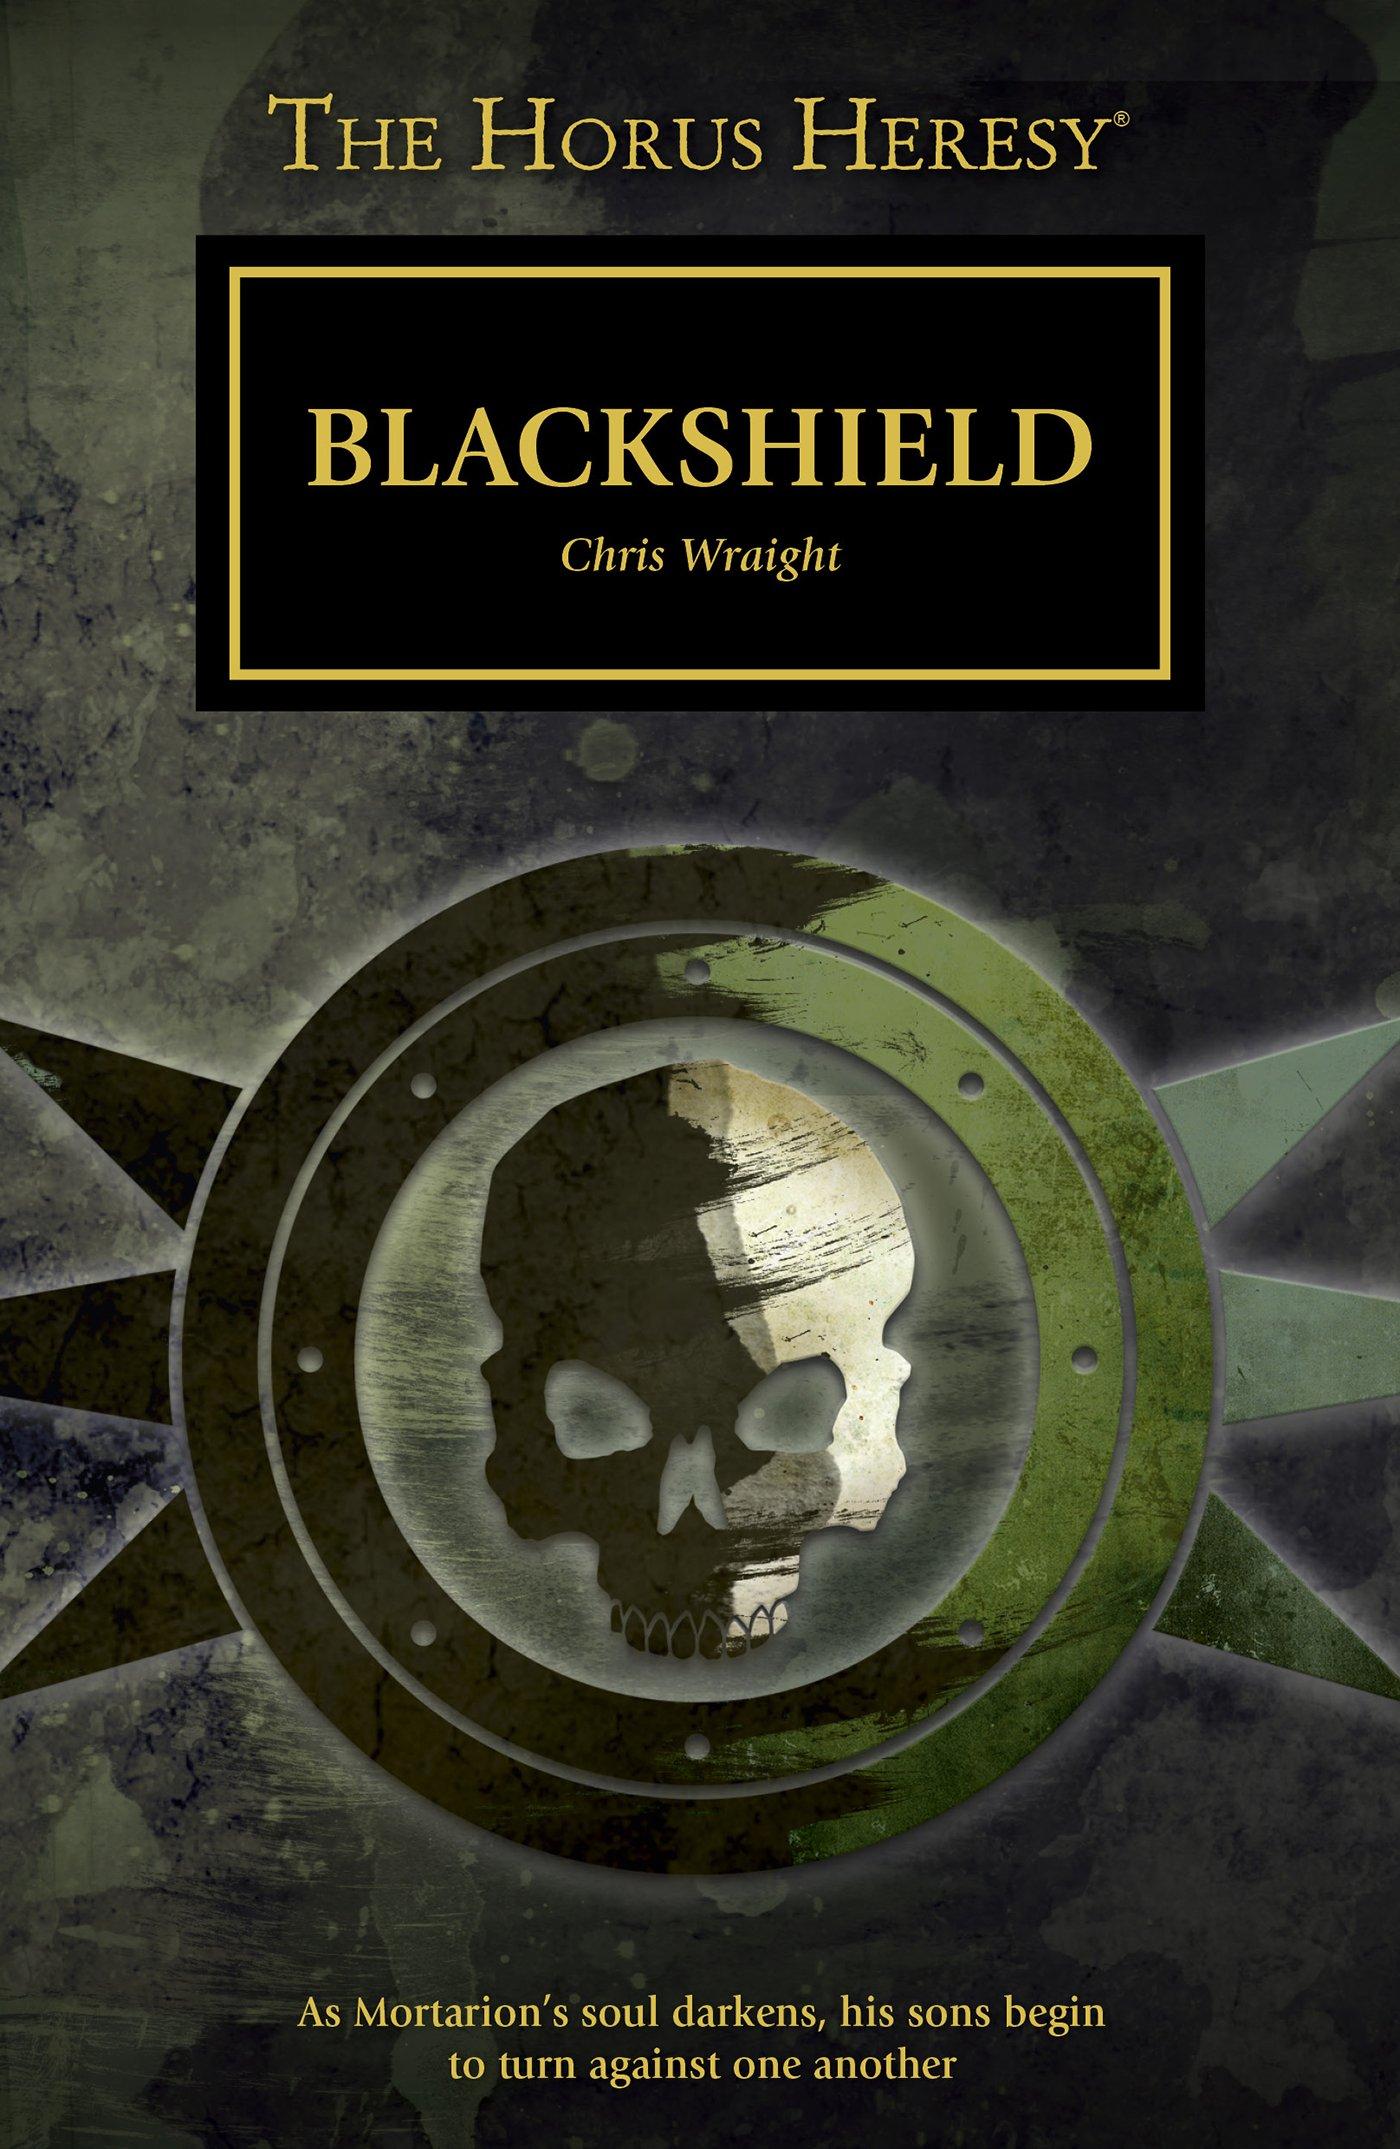 Blackshield by Chris Wraight